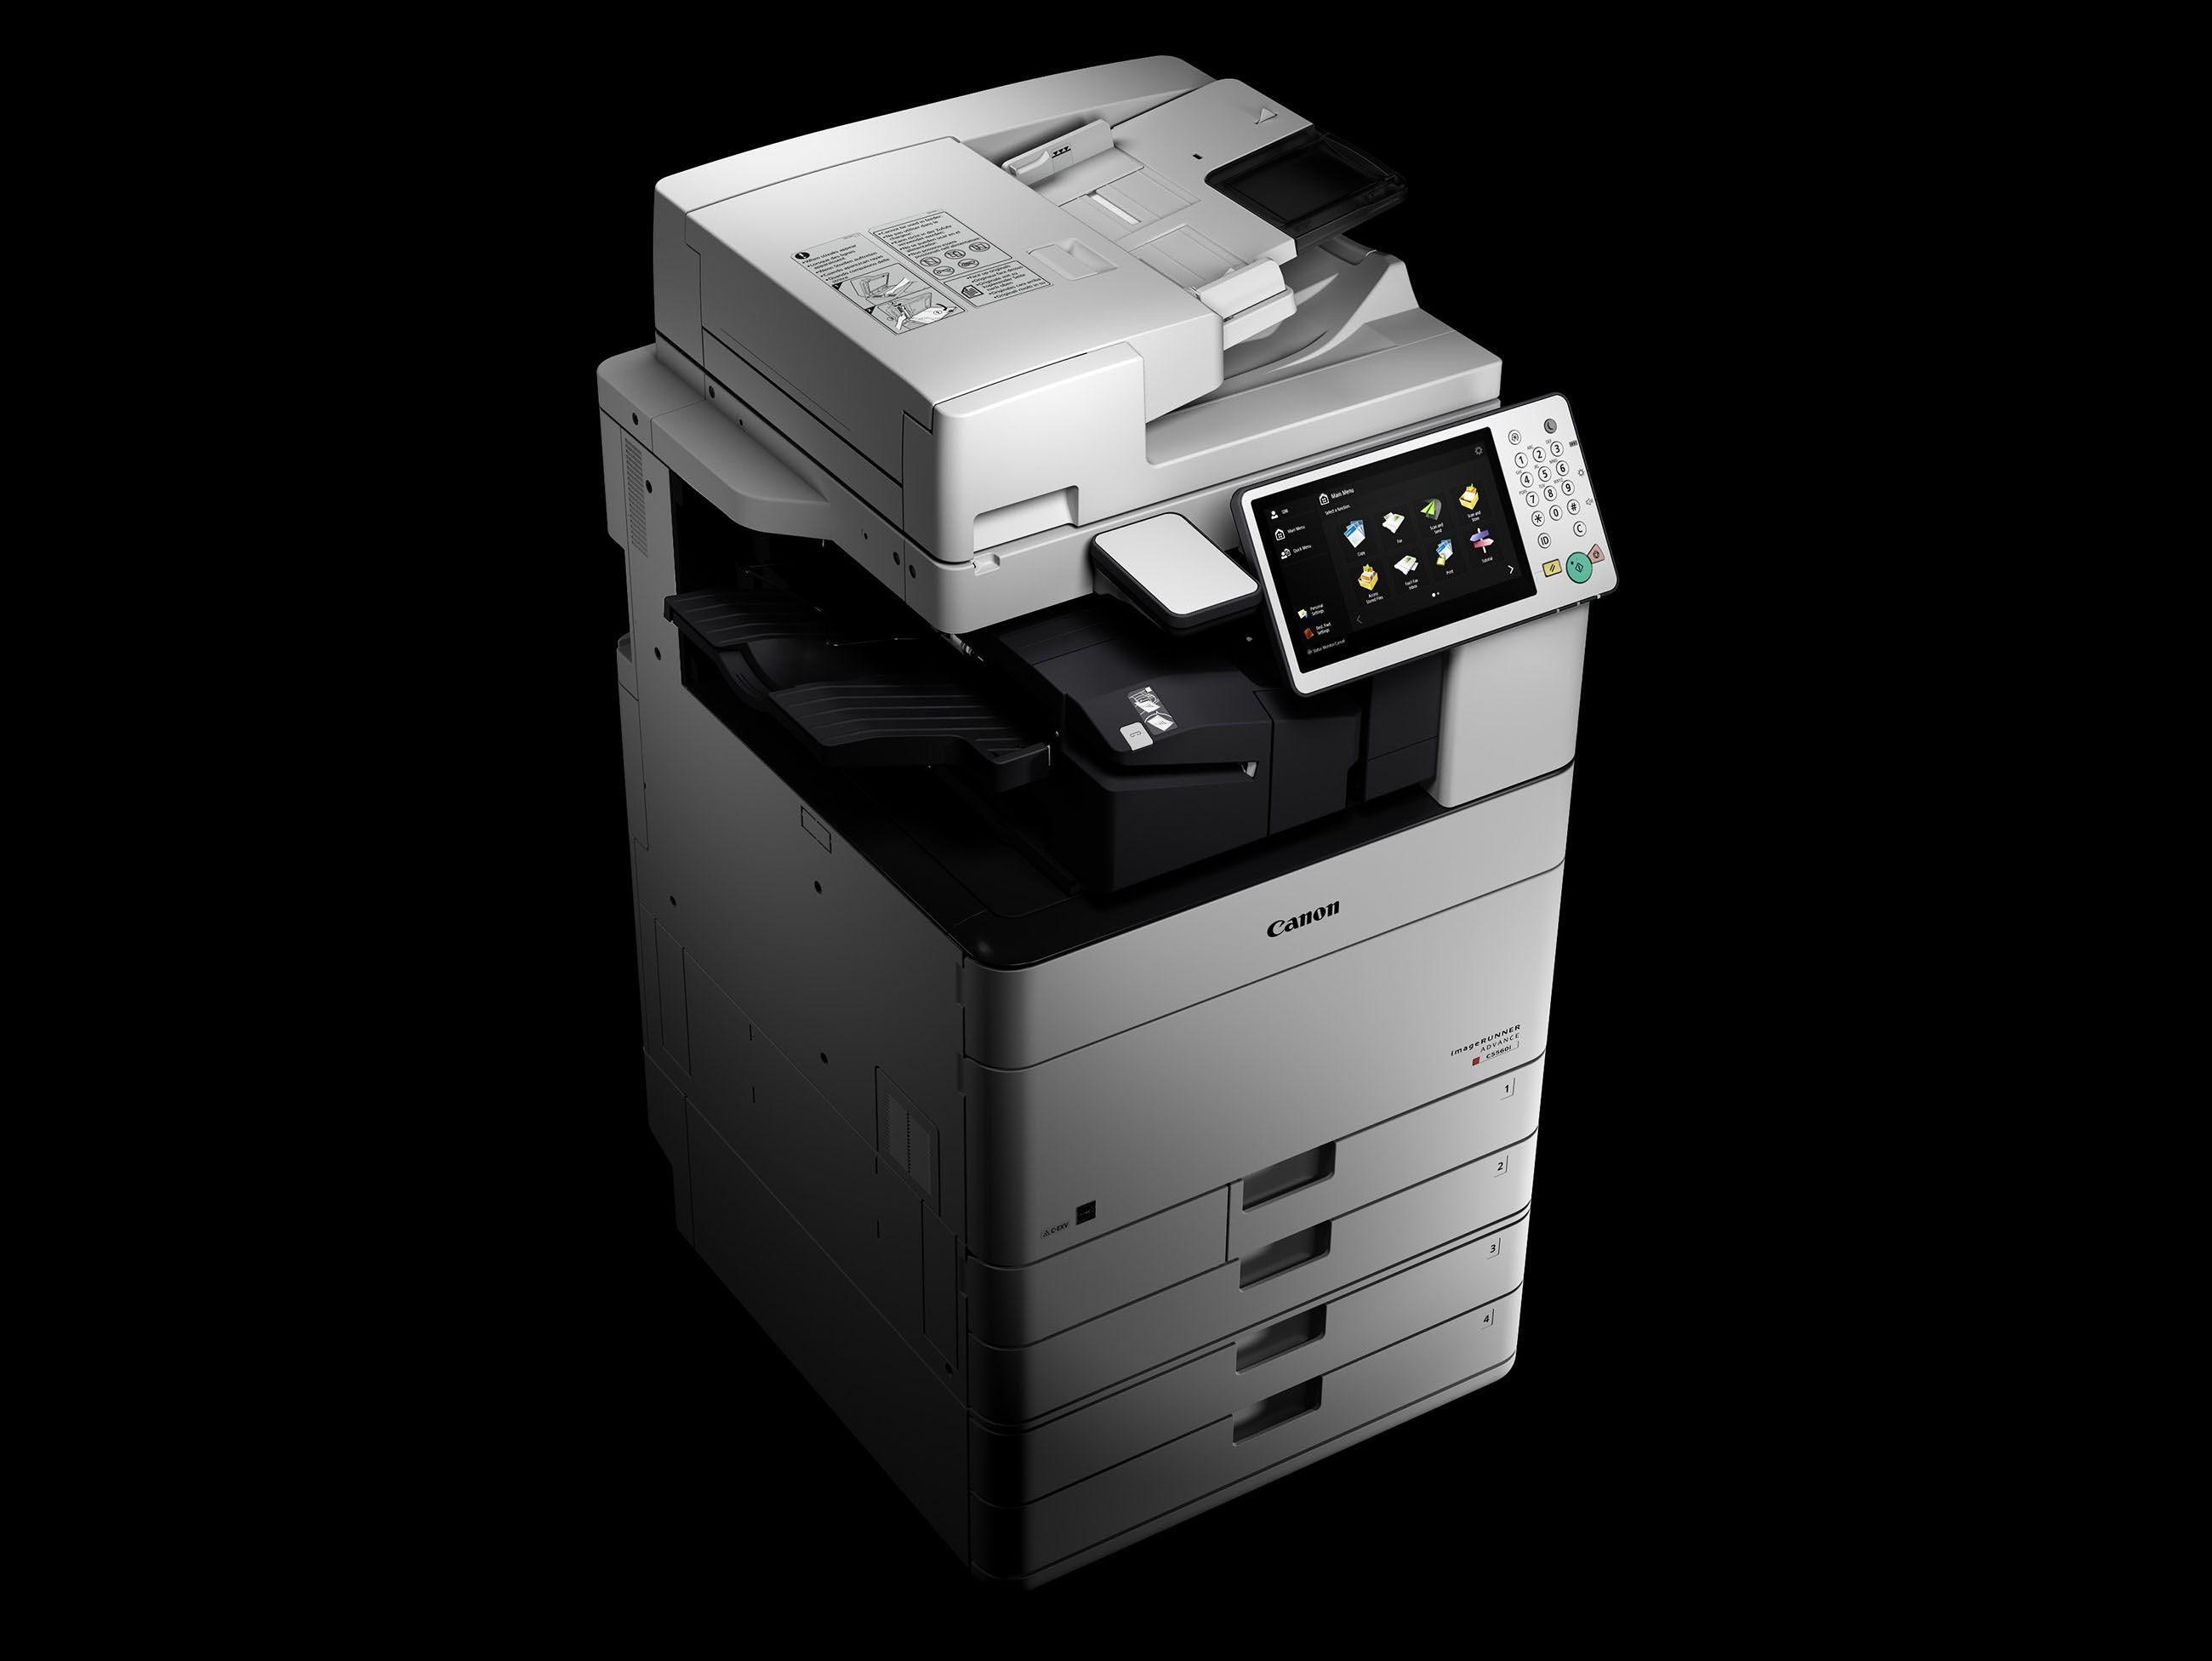 Canon imageRUNNER ADVANCE C5550i Multifunktionsdrucker